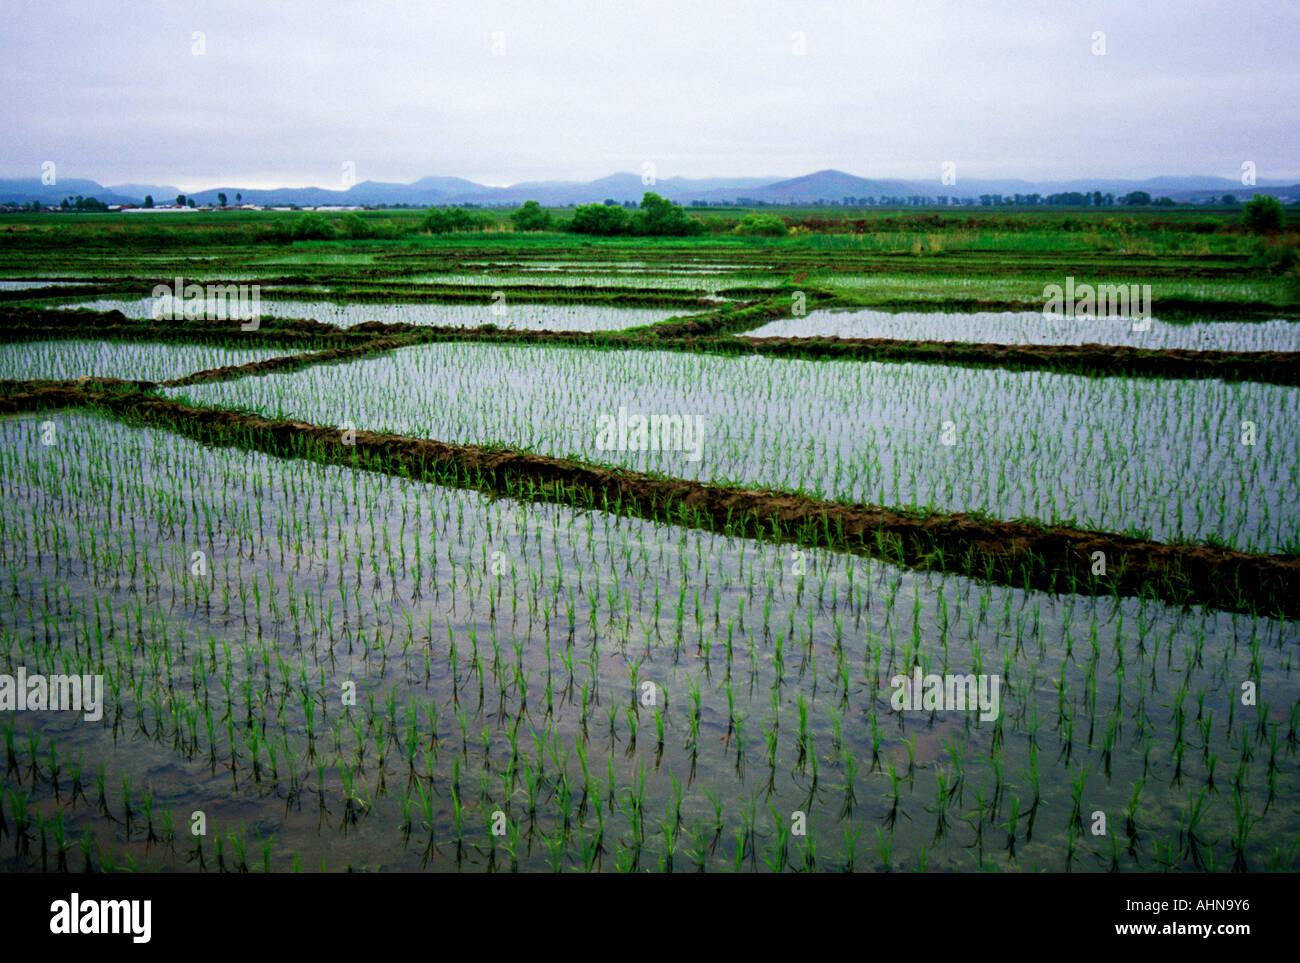 Rice paddies in Yanbian Chaoxian Autonomous Prefecture the Third Korea in Northeast Jilin province China - Stock Image